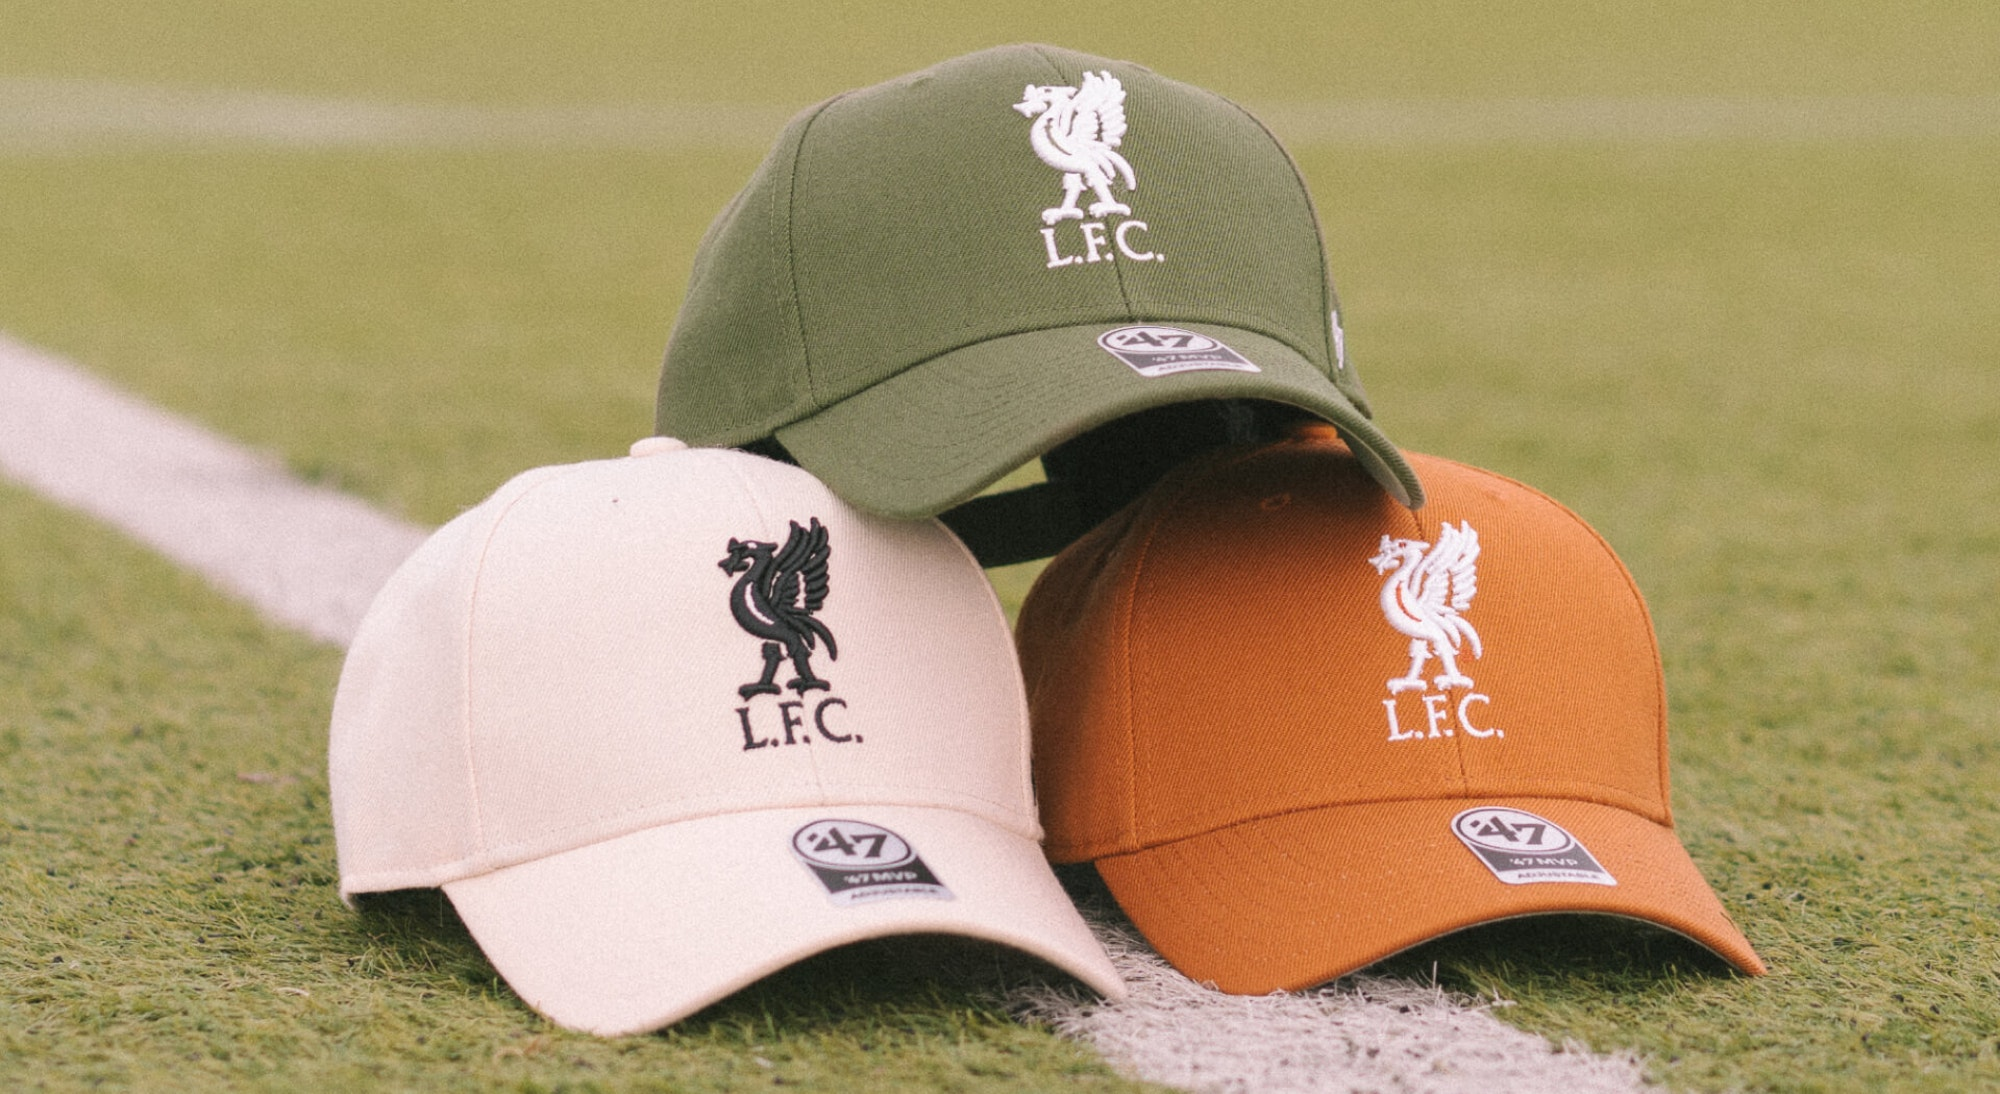 Hatstore x '47 Liverpool Fall 2020